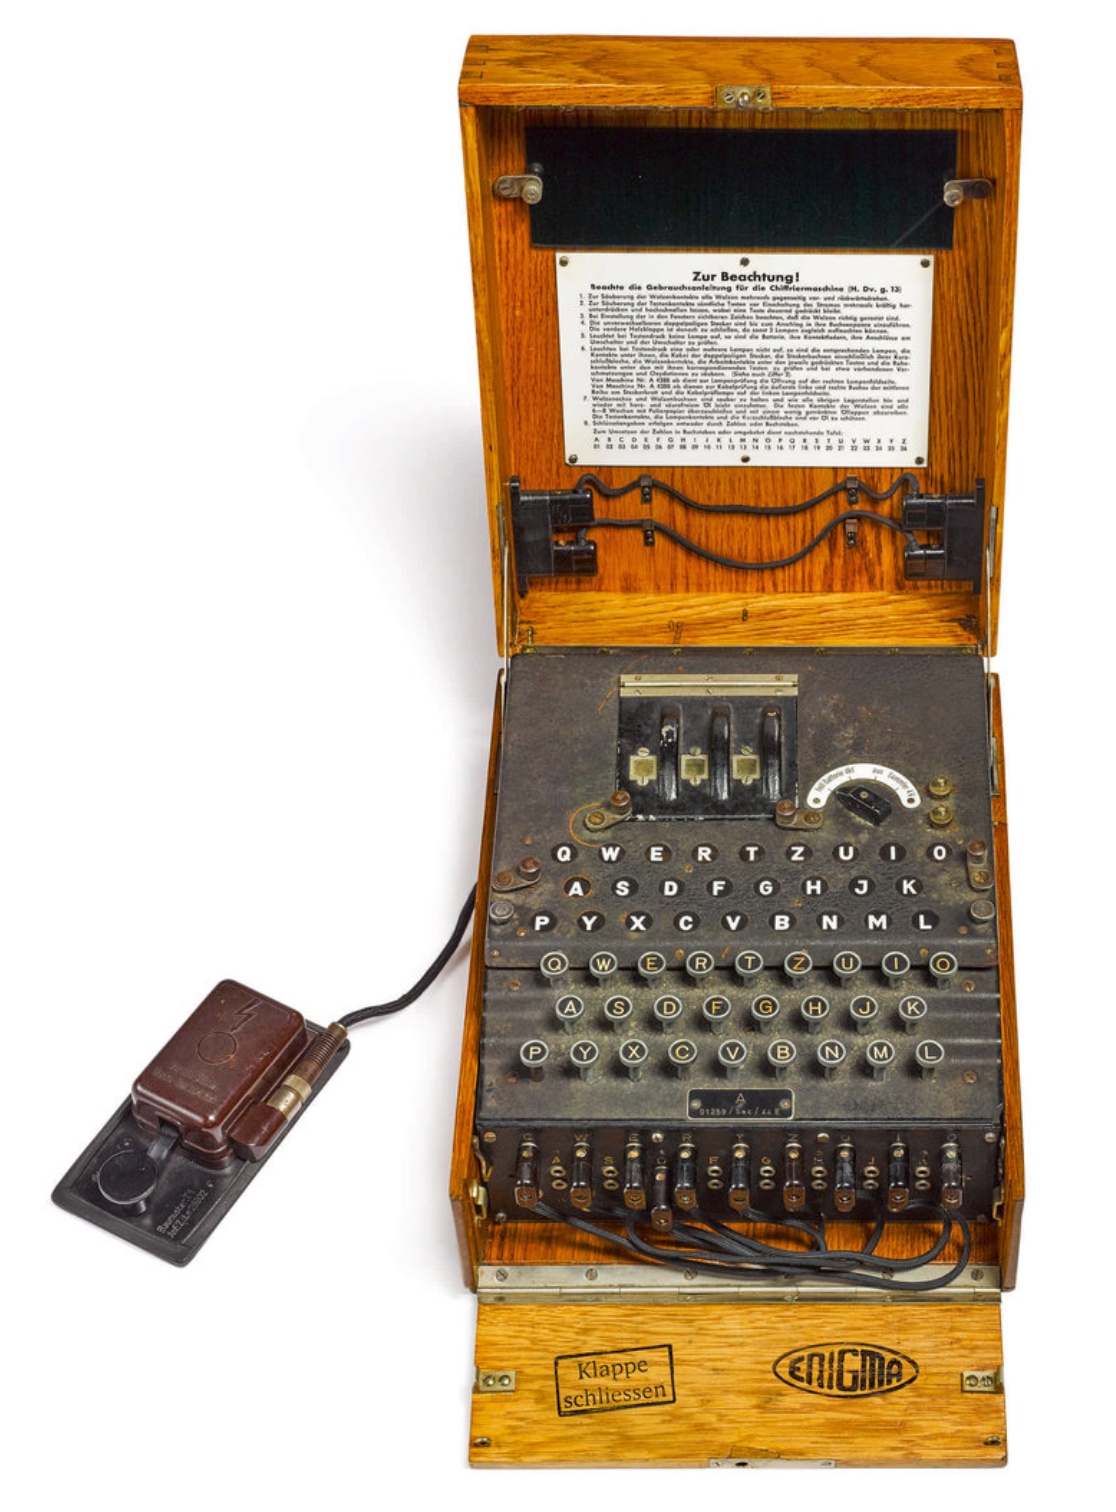 World War II Enigma cipher machine up for auction